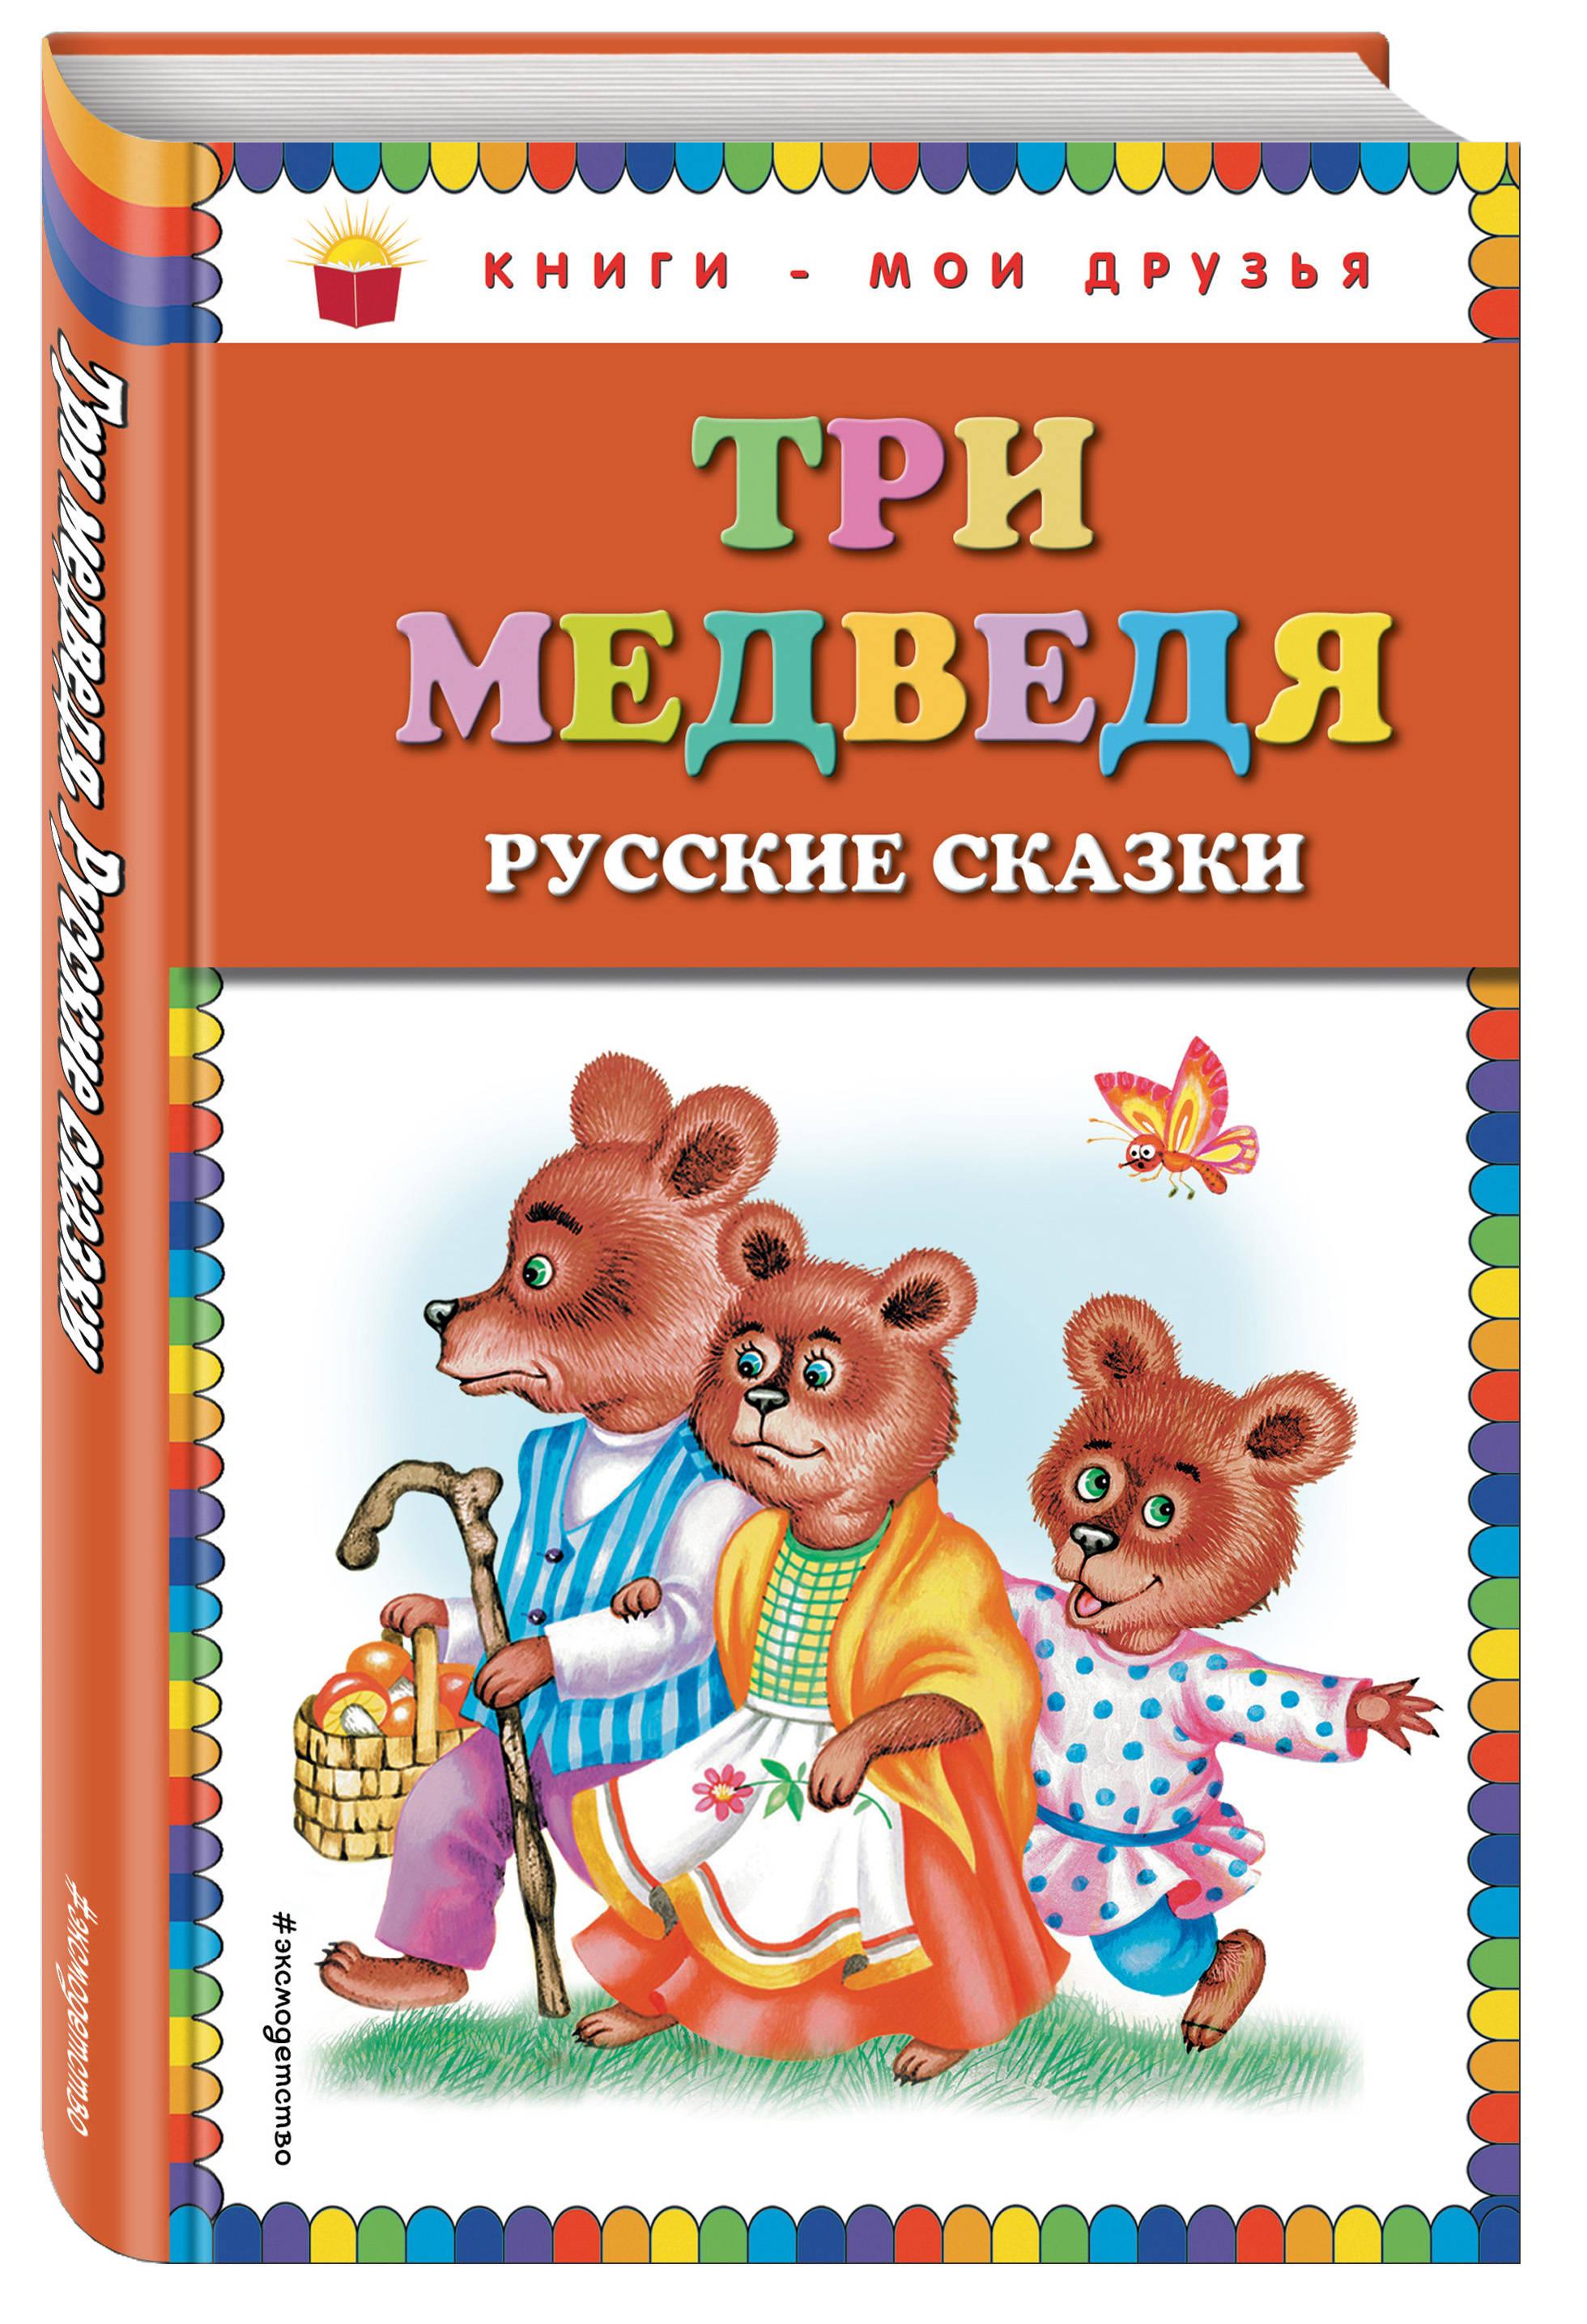 Три медведя. Русские сказки (ст. изд.)